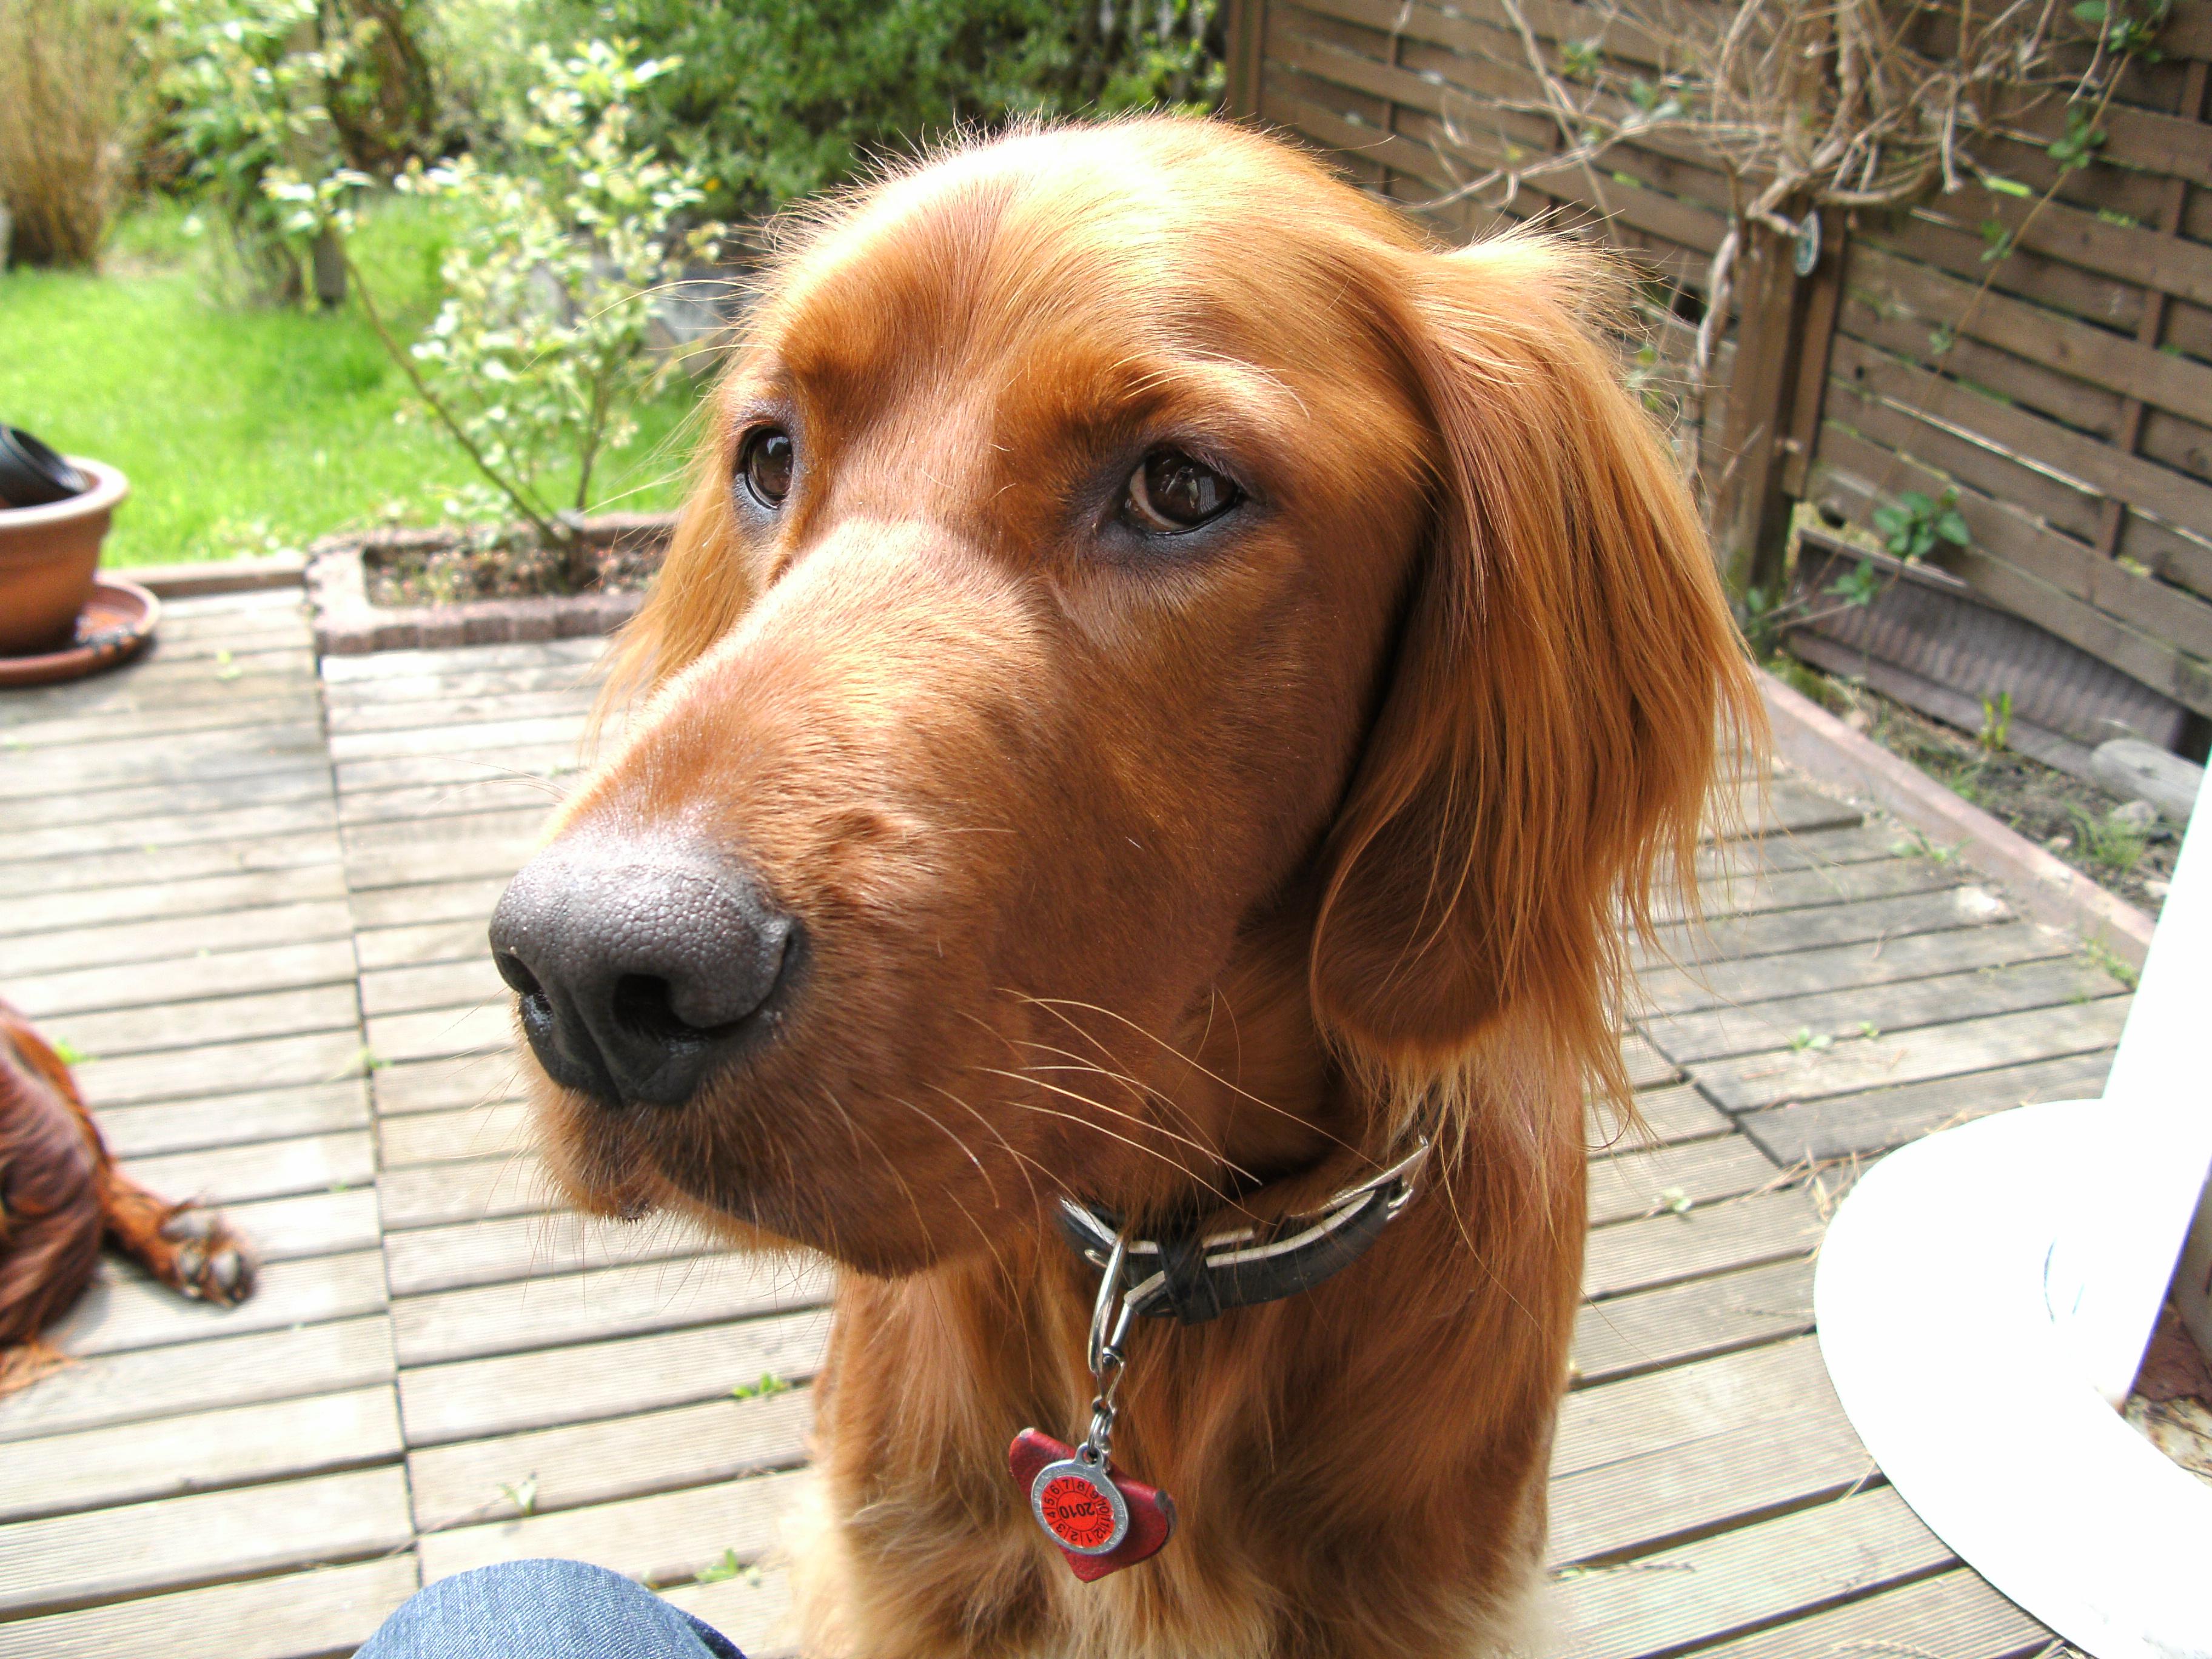 Irish Setter dog face wallpaper